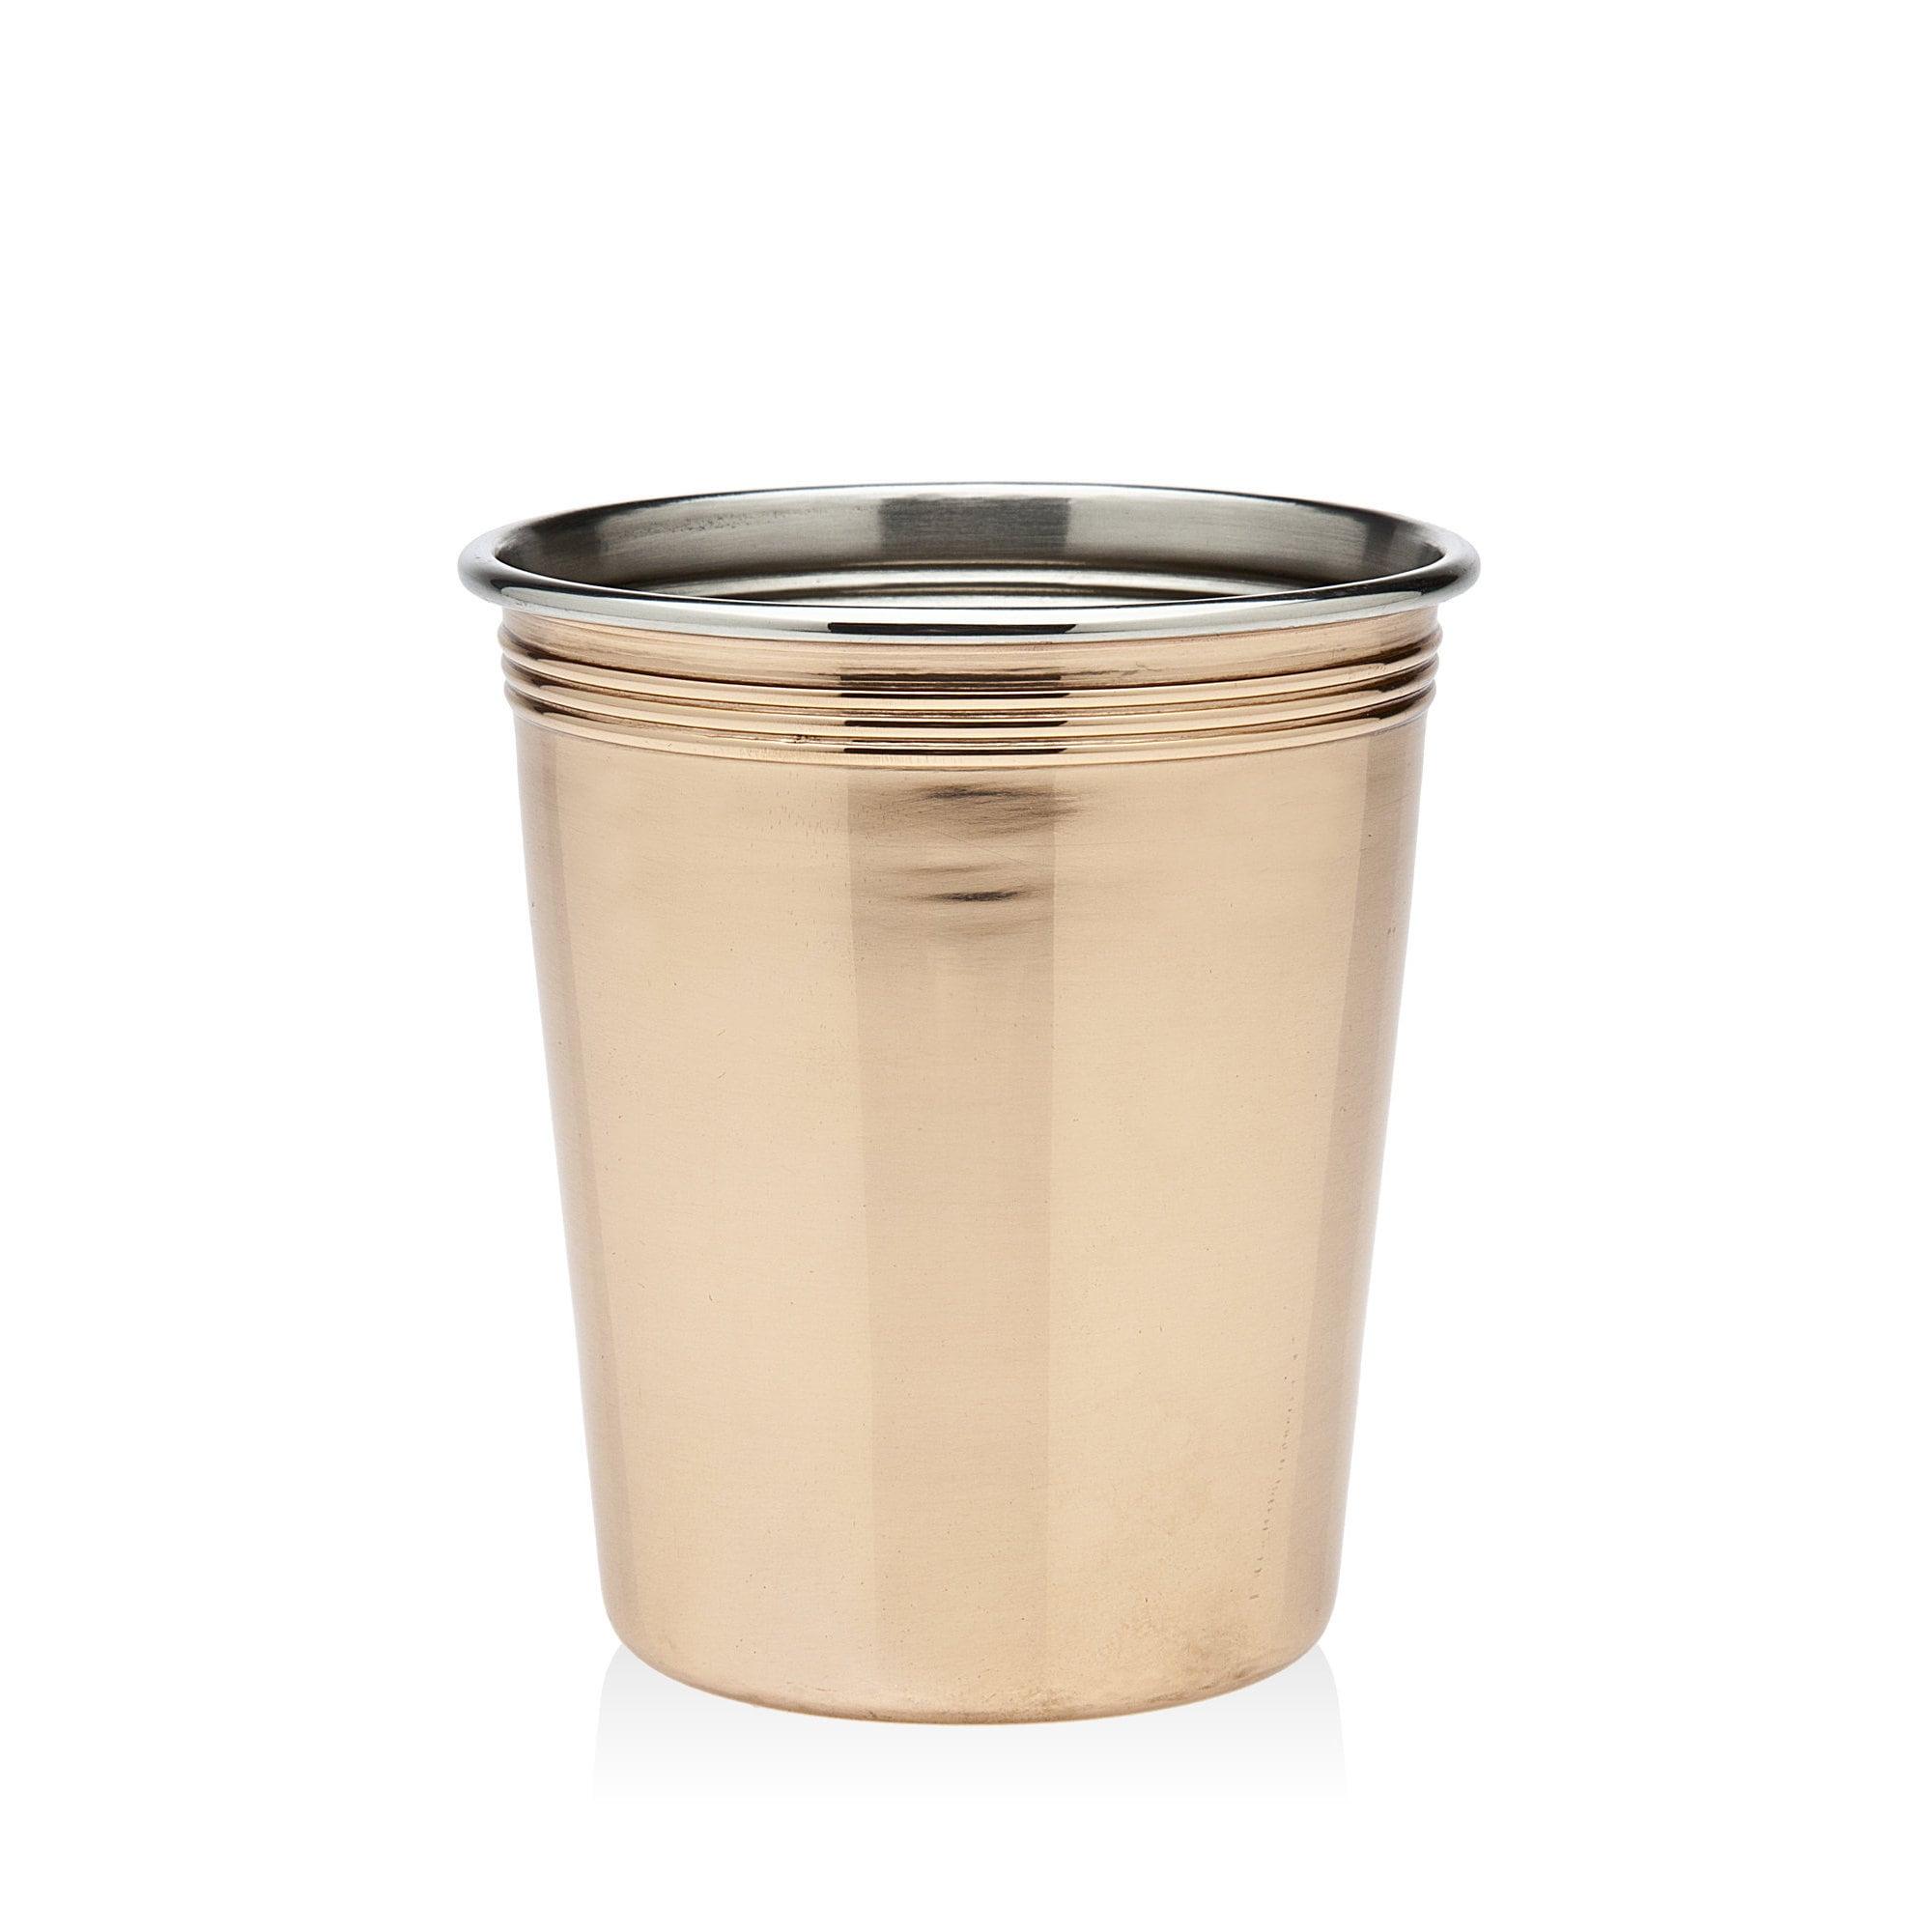 Godinger Plain Copper Mint Julep Tumbler (Mint Julep), Go...